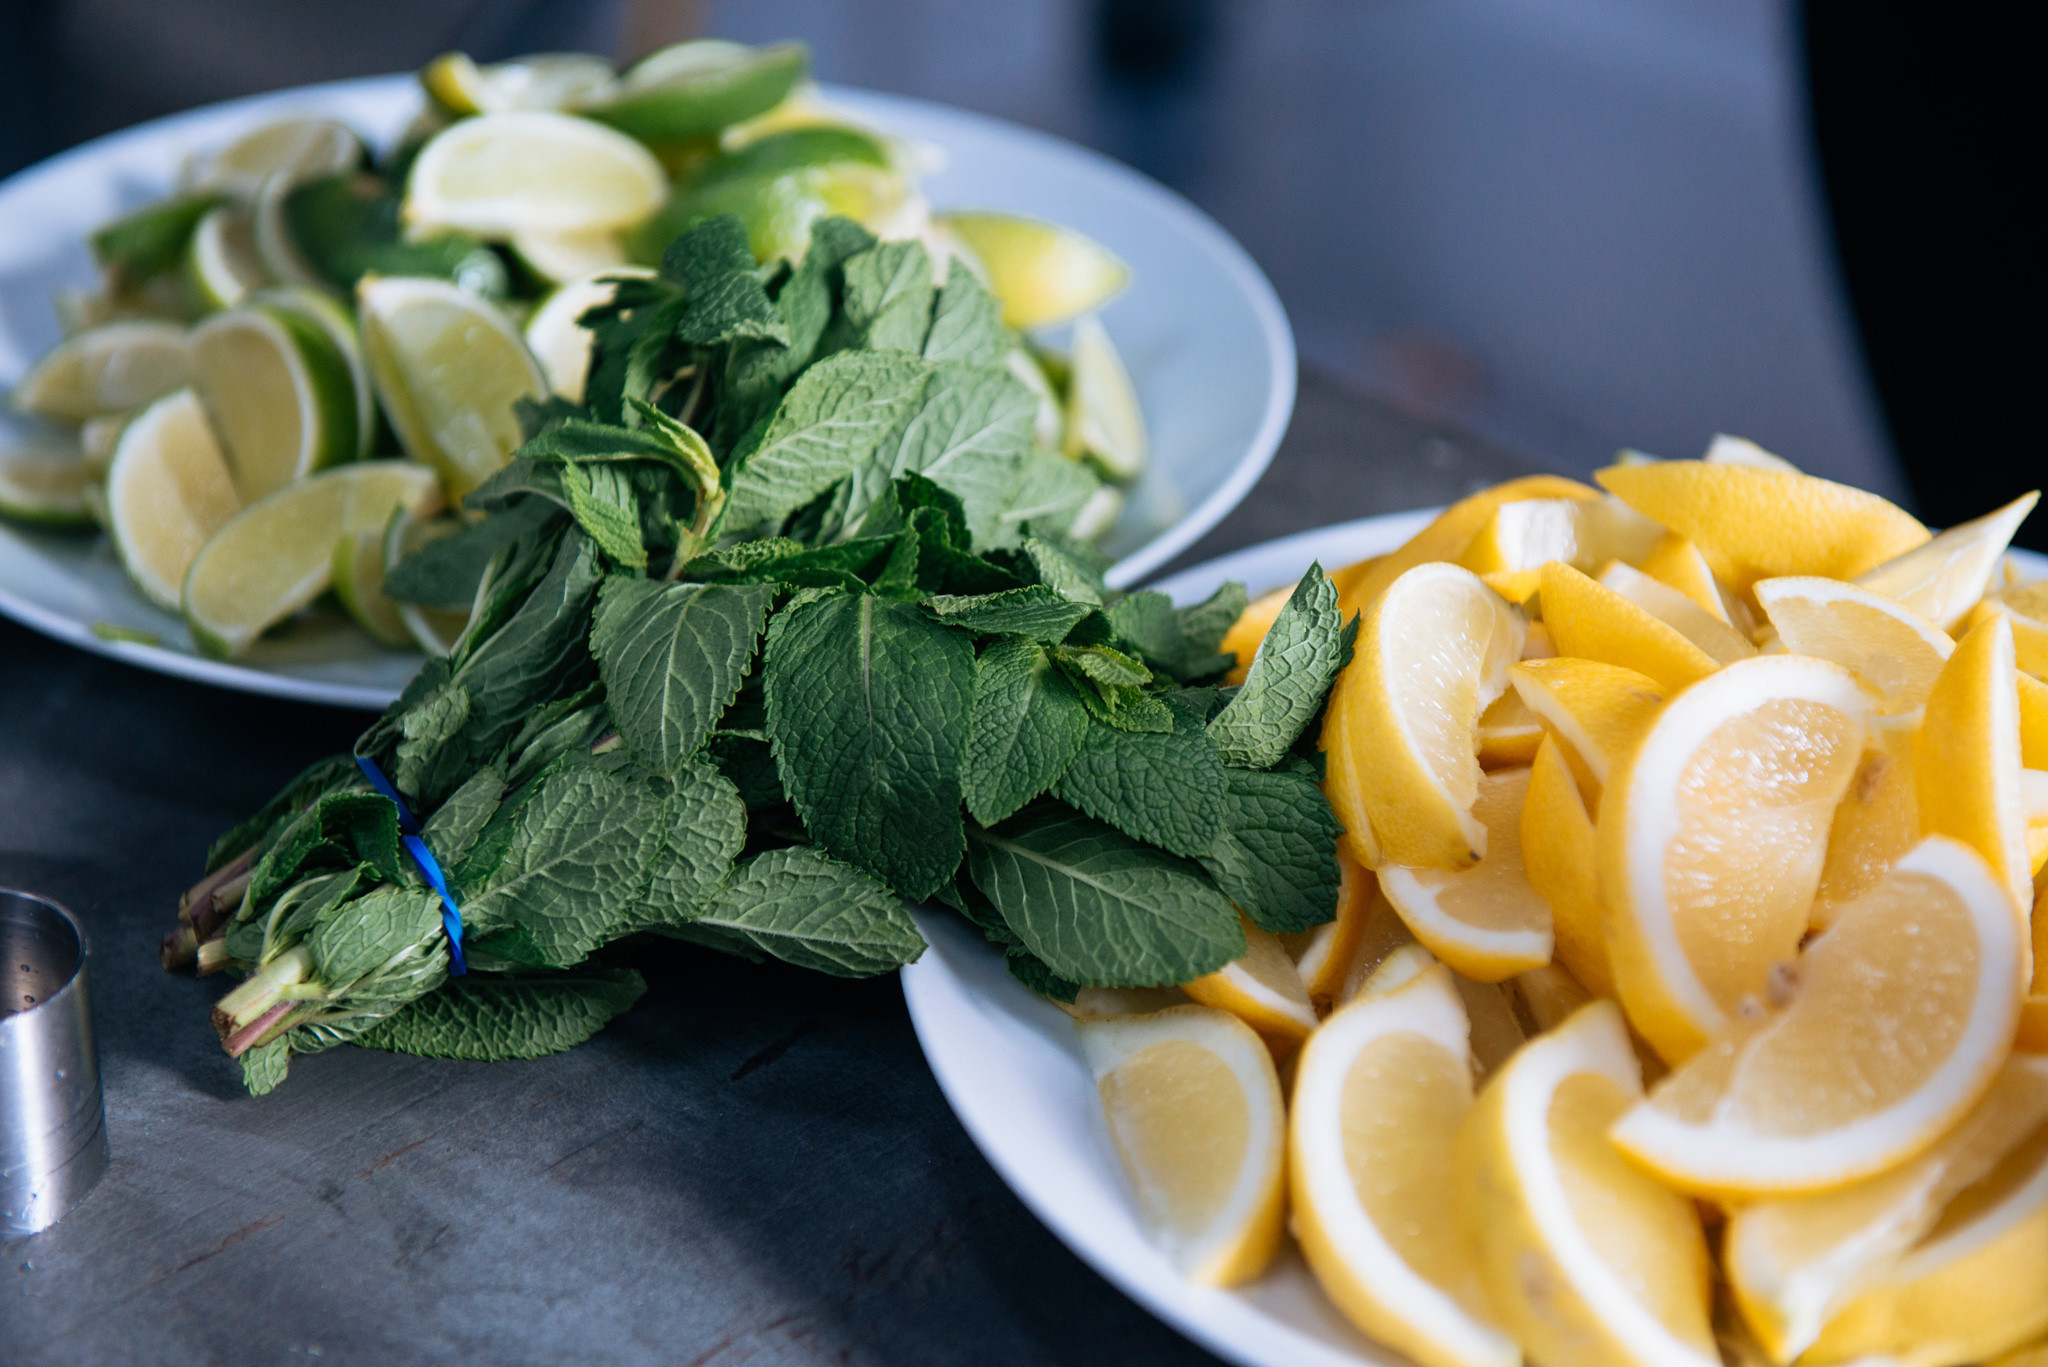 Lemons and Limes - Food product photography